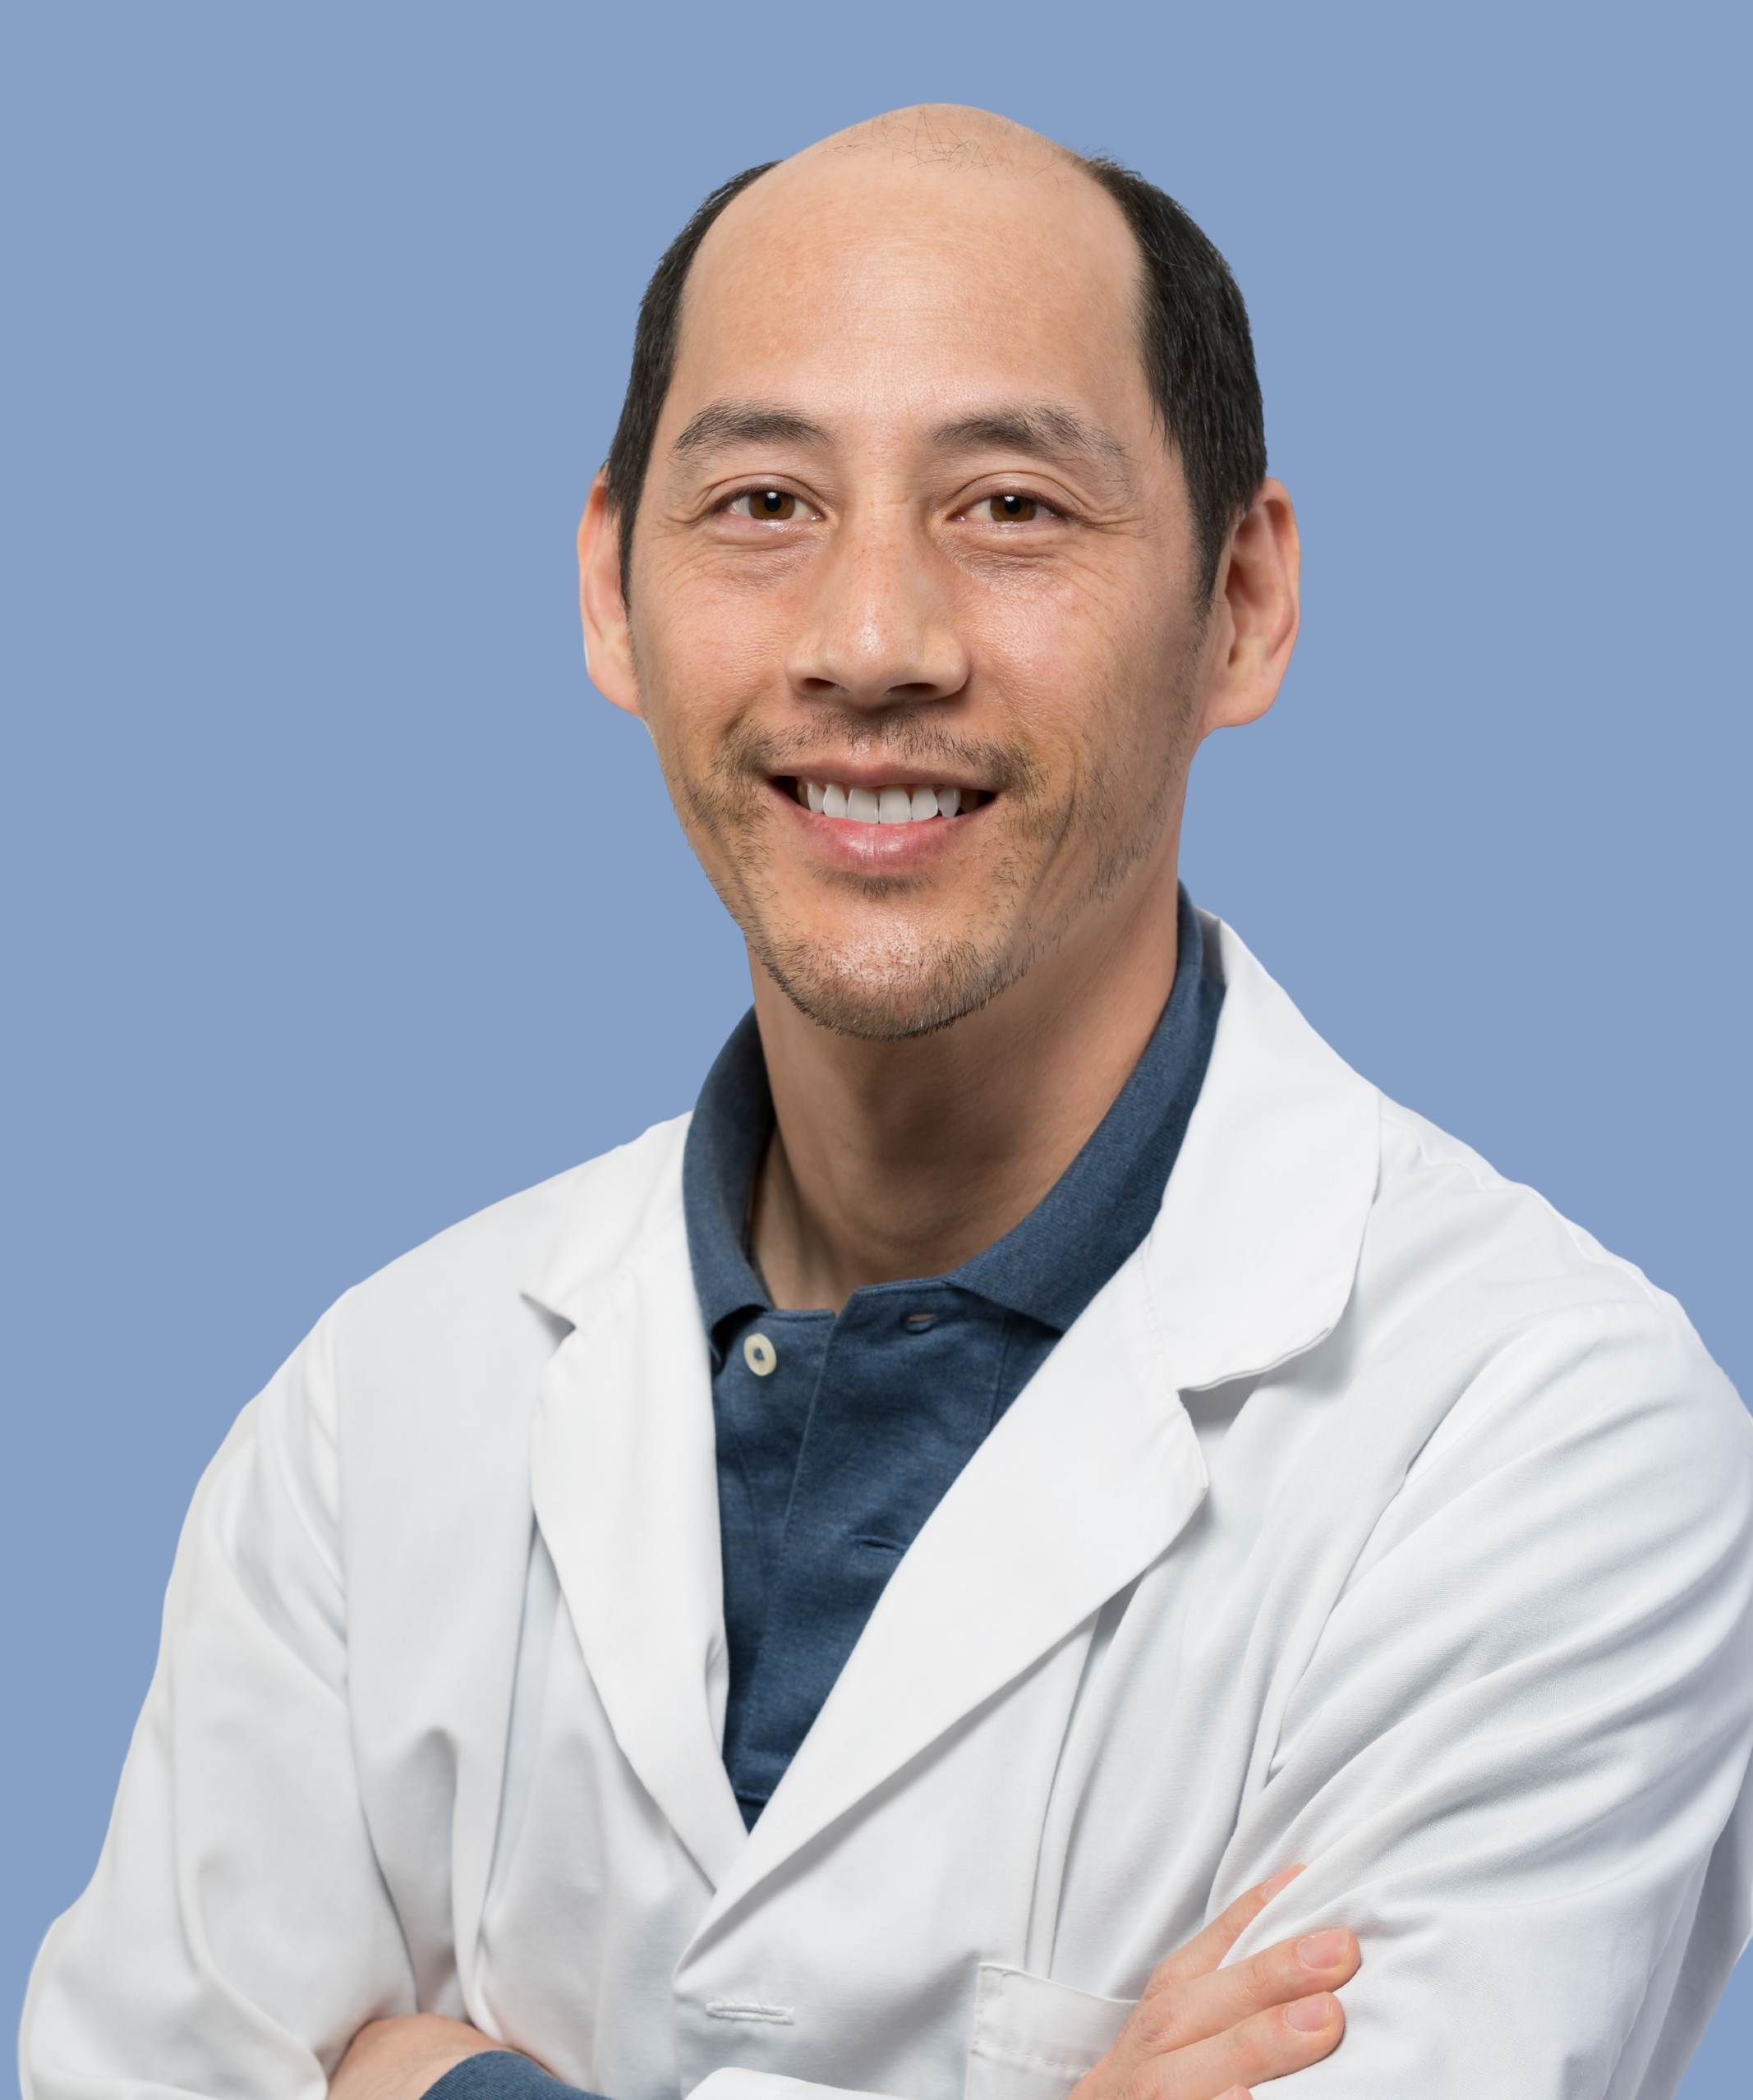 Dr. Eric Grose